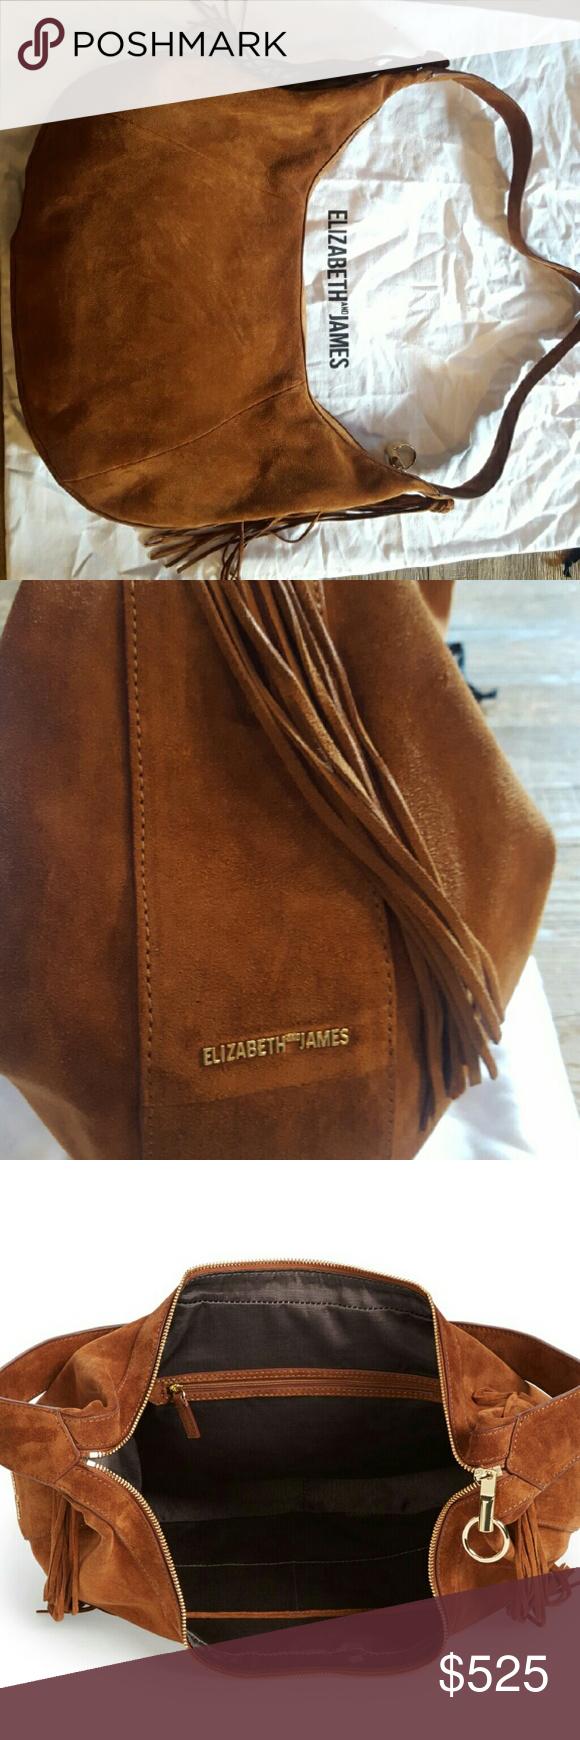 handbag suede hobo bag Elizabeth and James Bags Hobos